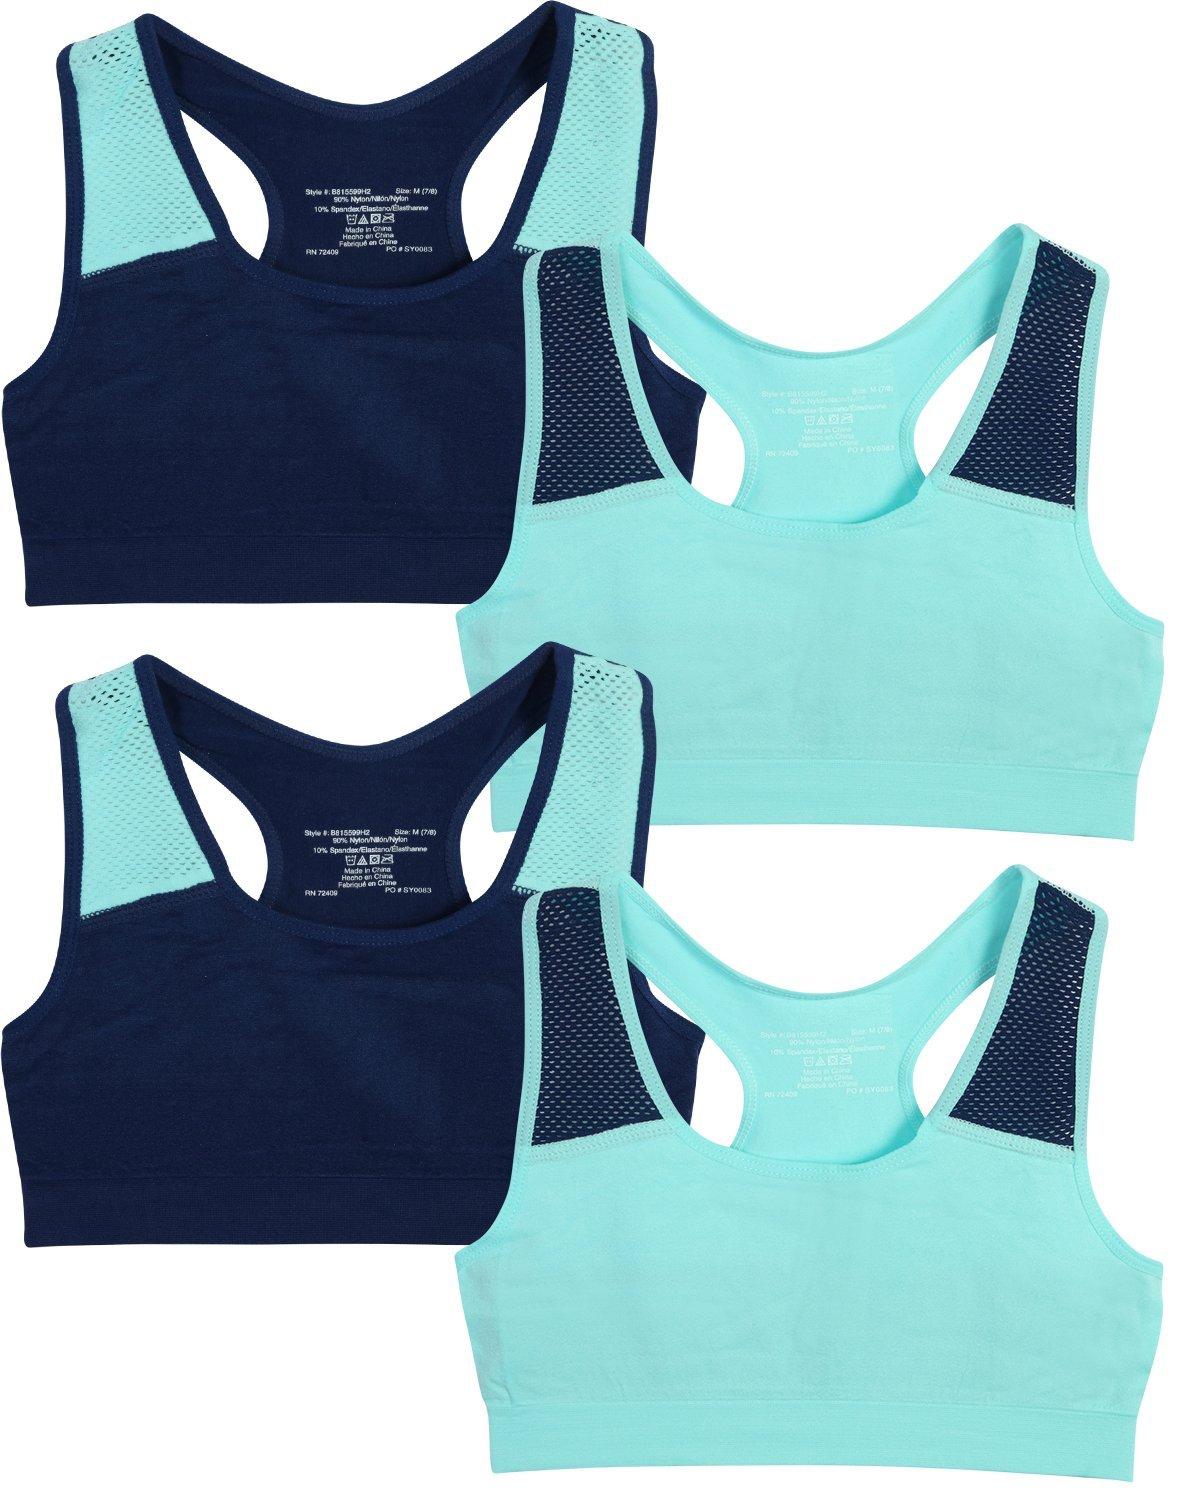 Only Girls by Rene ROFE Girl Seamless Criss Cross Racerback Sports Bra, (4 Pack) (Medium - 7/8, Aqua & Navy)'